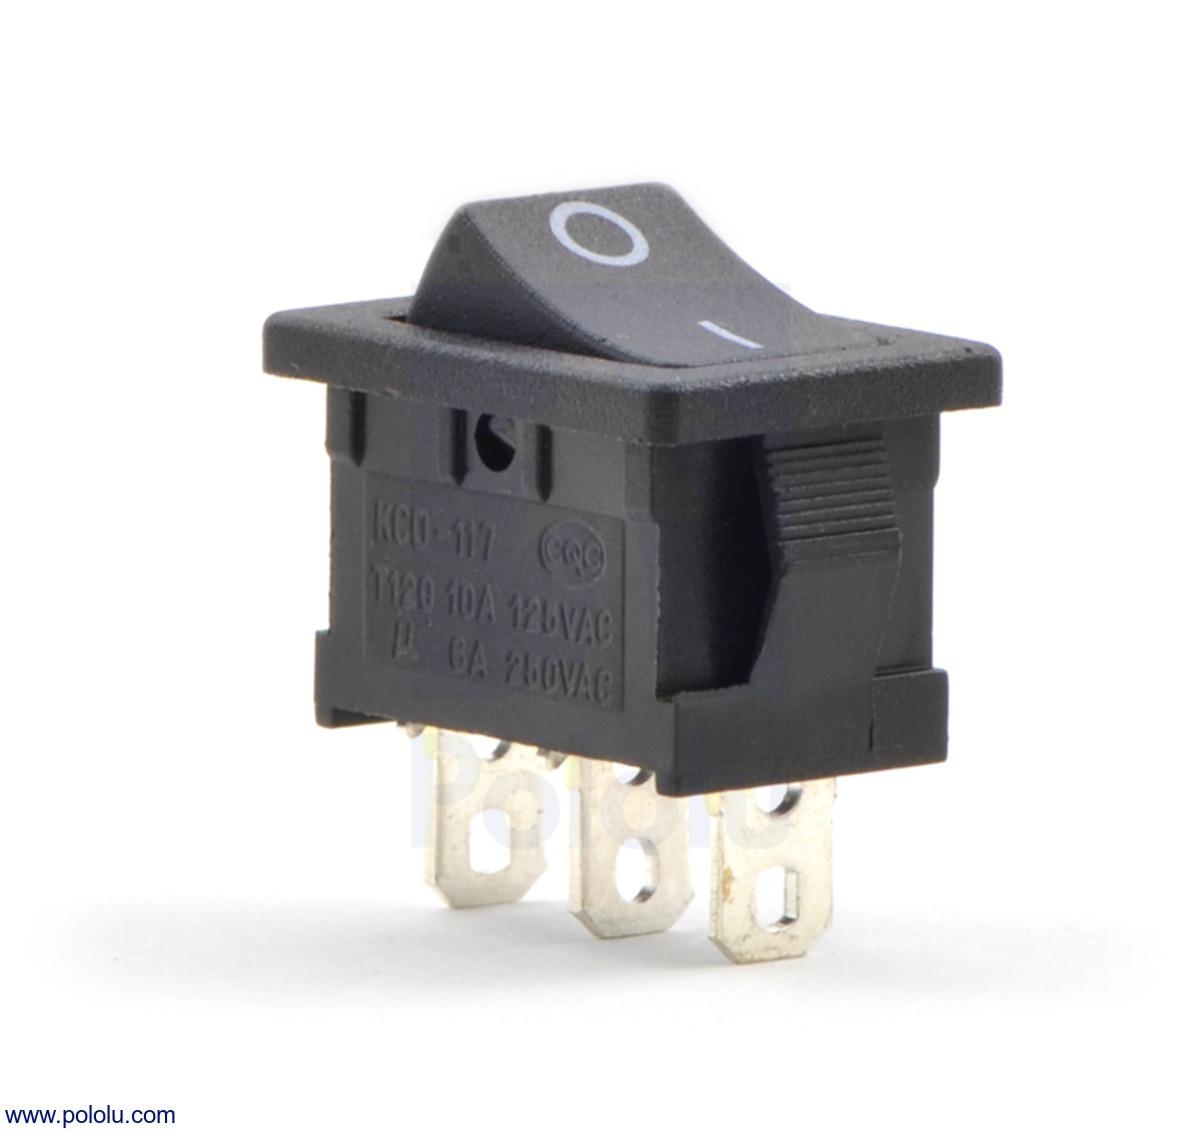 Rocker Switch: 3-Pin, SPDT, 10A | Taster/Schalter | Zubehör | EXP Tech